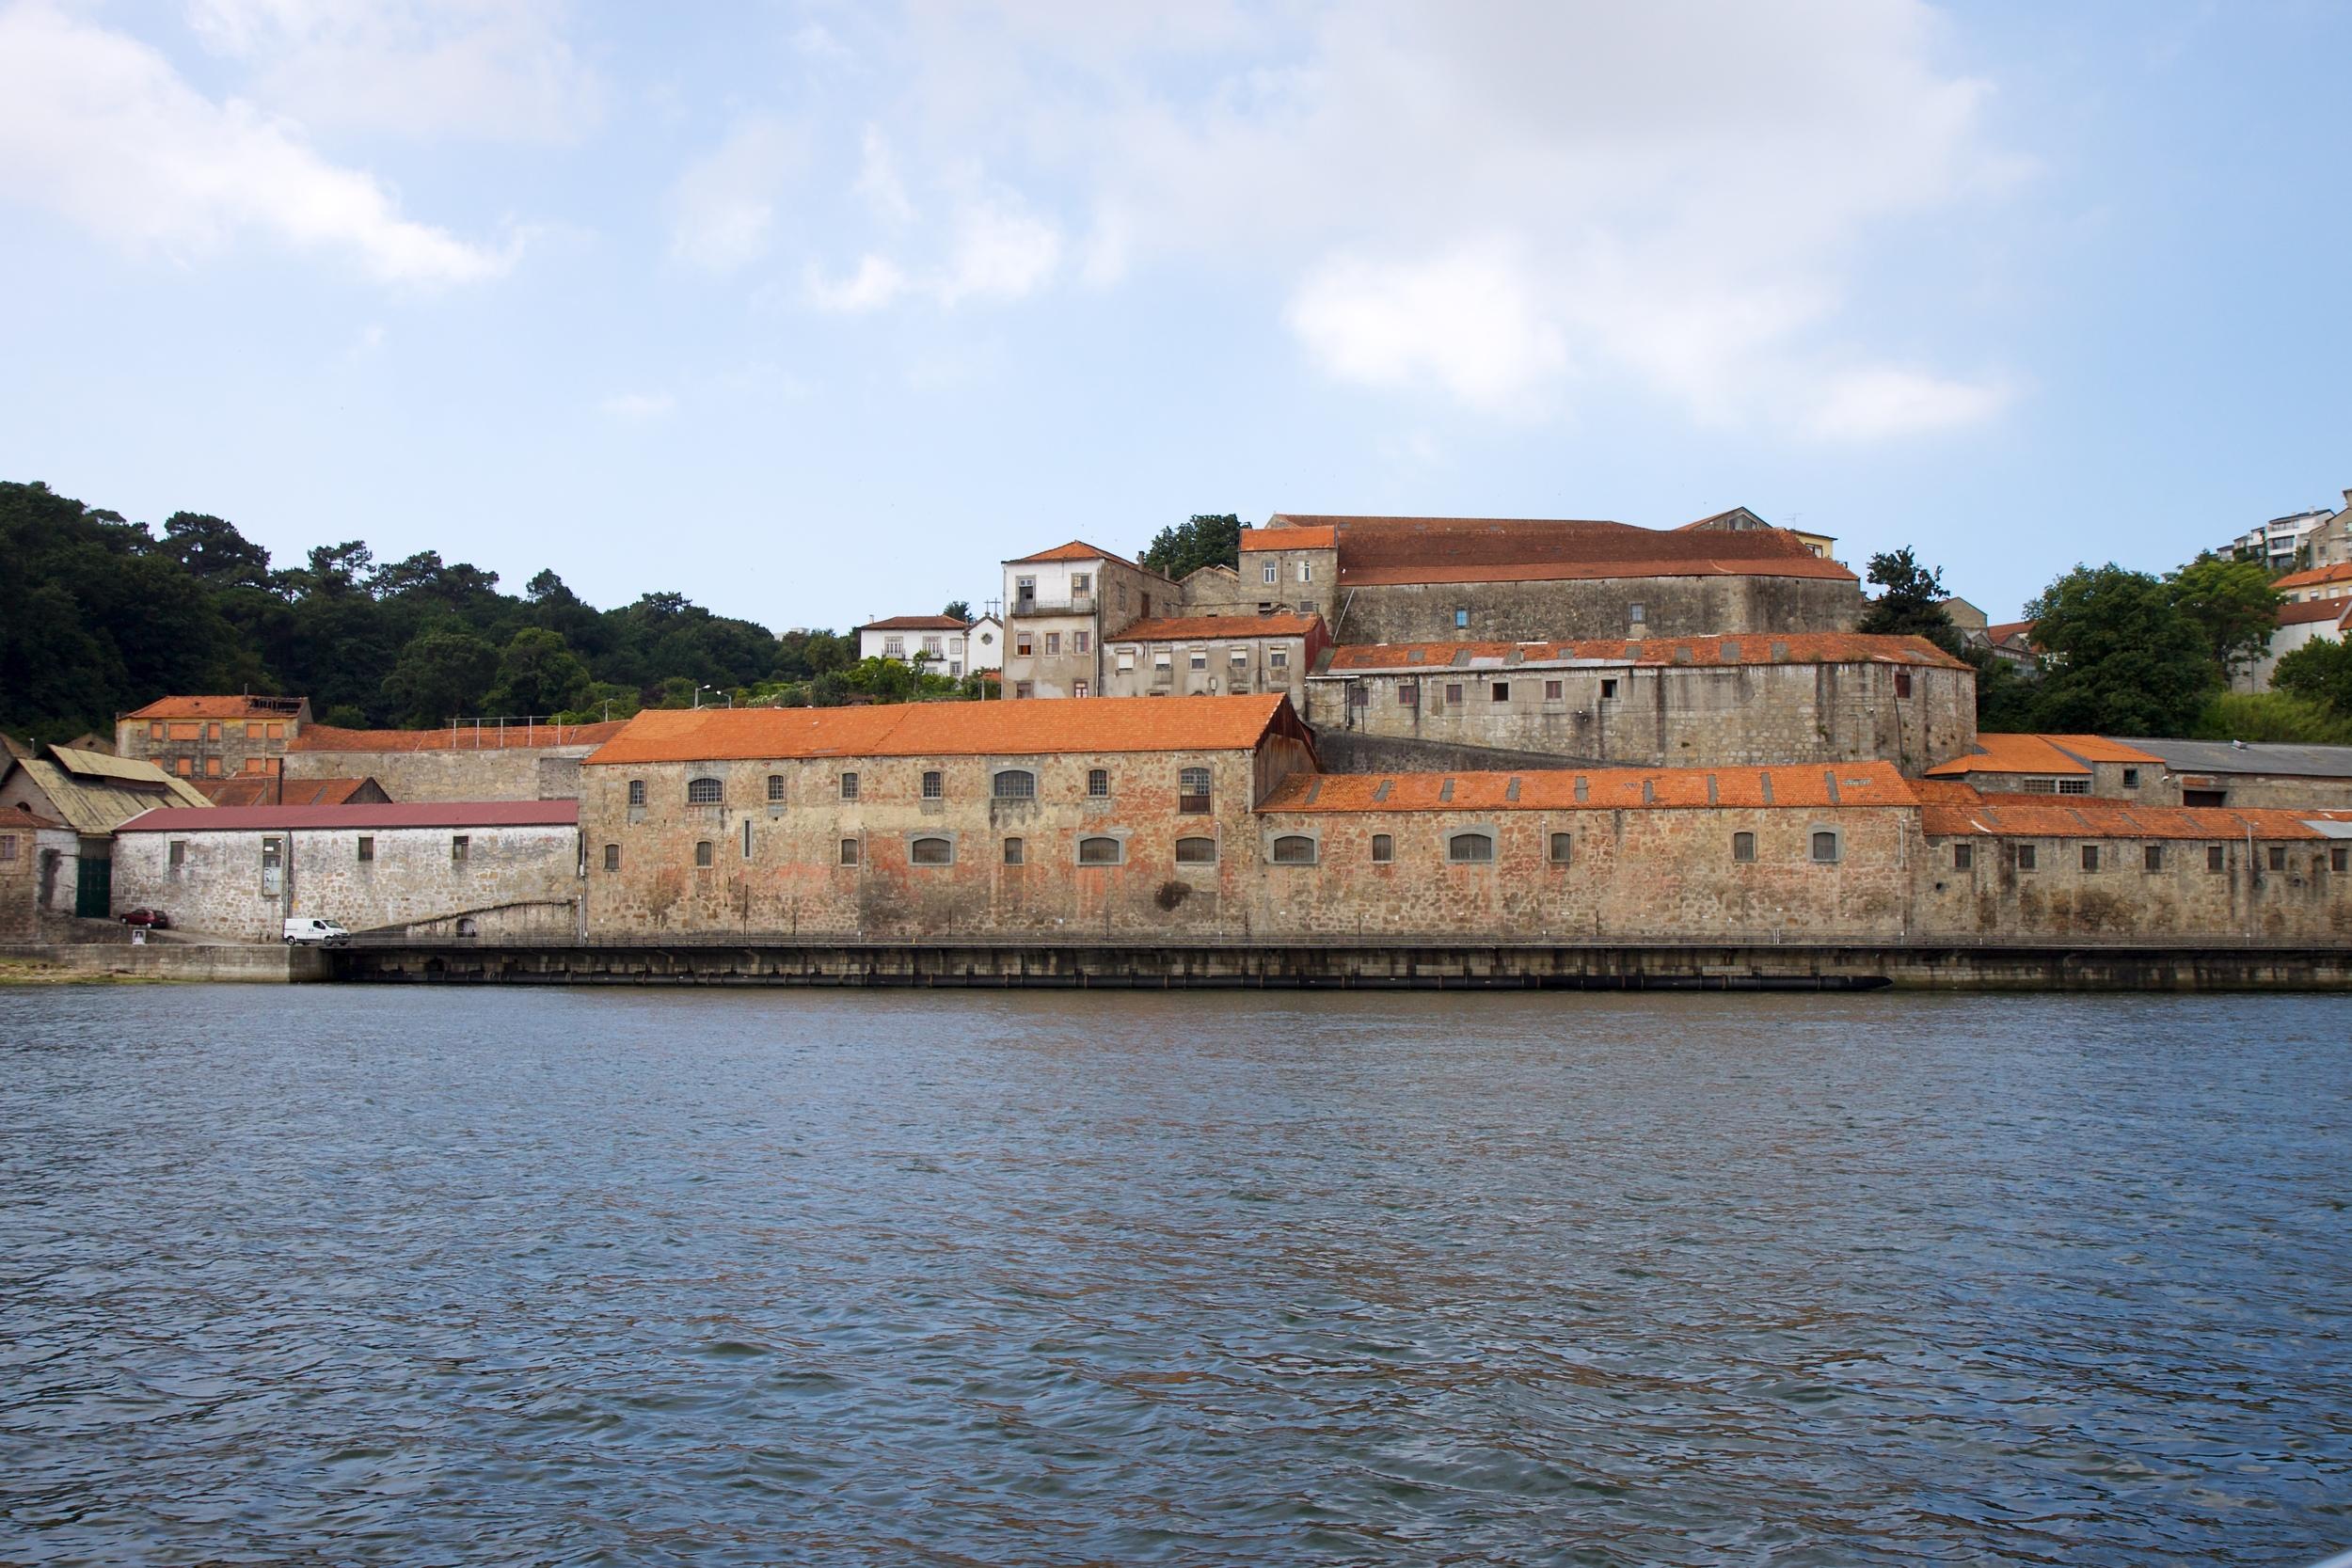 porto-juillet-2011-239.jpg